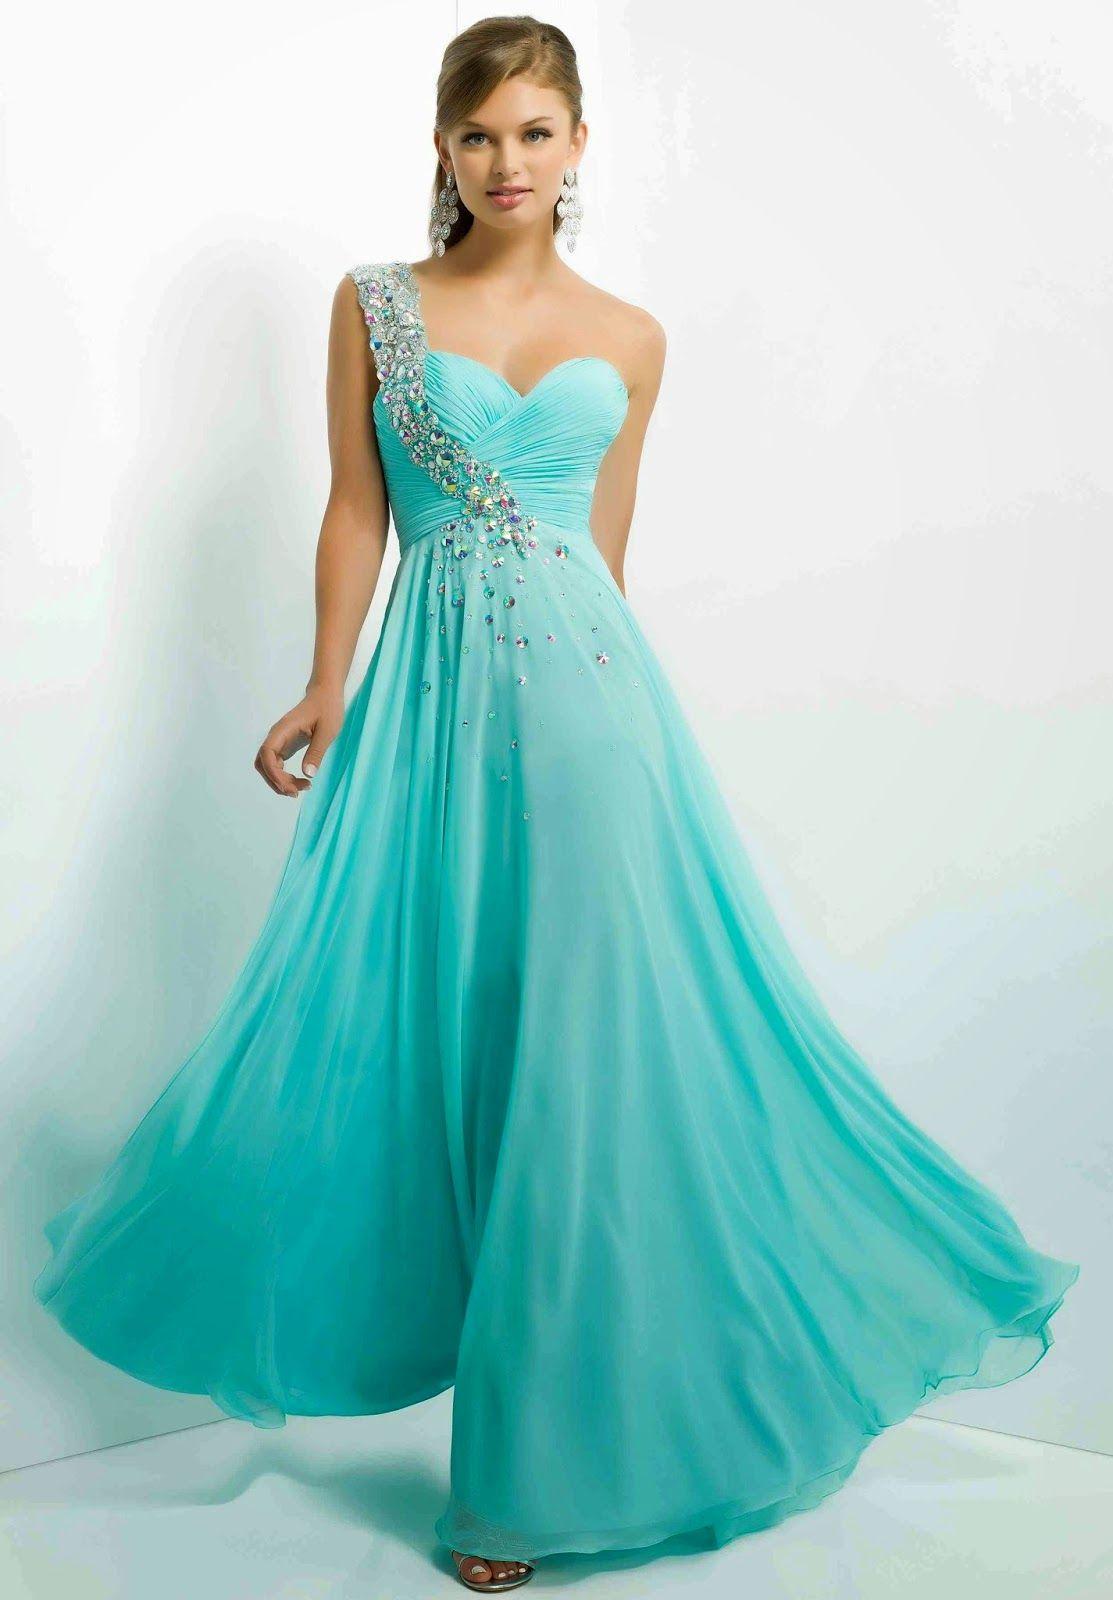 Vestidos largos de gala | Vestidos | Pinterest | Clothes